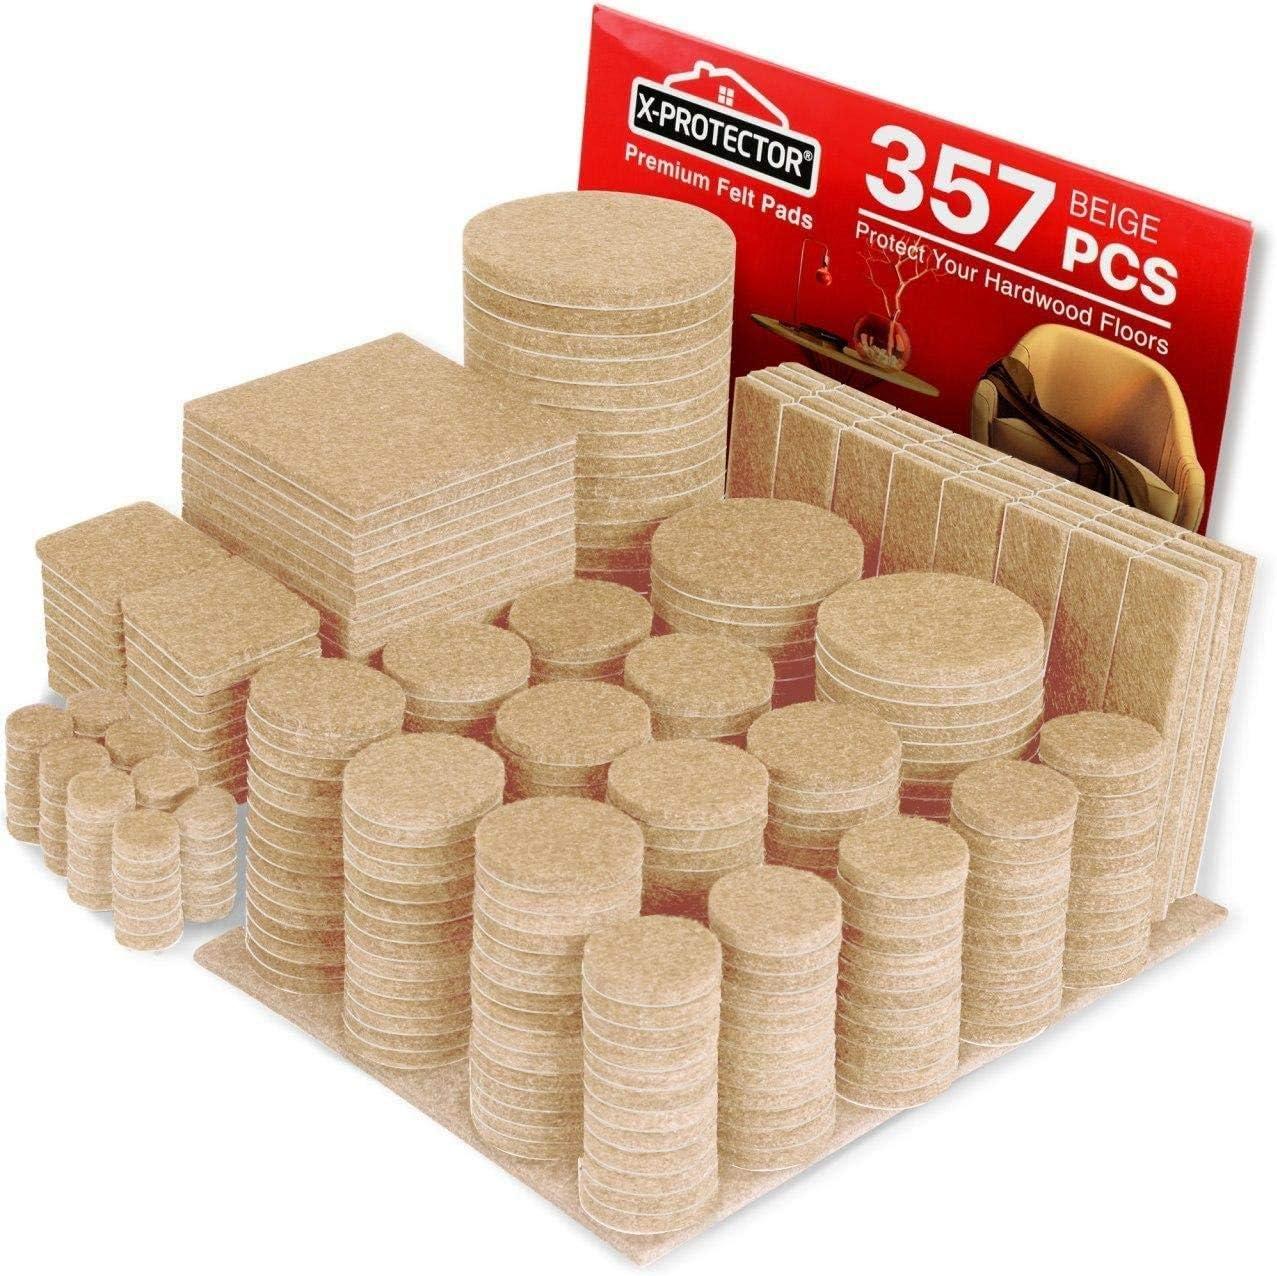 Felt Furniture Pads X-PROTECTOR - 357 Premium Felt Pads Floor Protector - Huge Pack of Chair Felts Pads for Furniture Feet - Best Furniture Pads for Hardwood Floors - Protect Your Wood Floors!